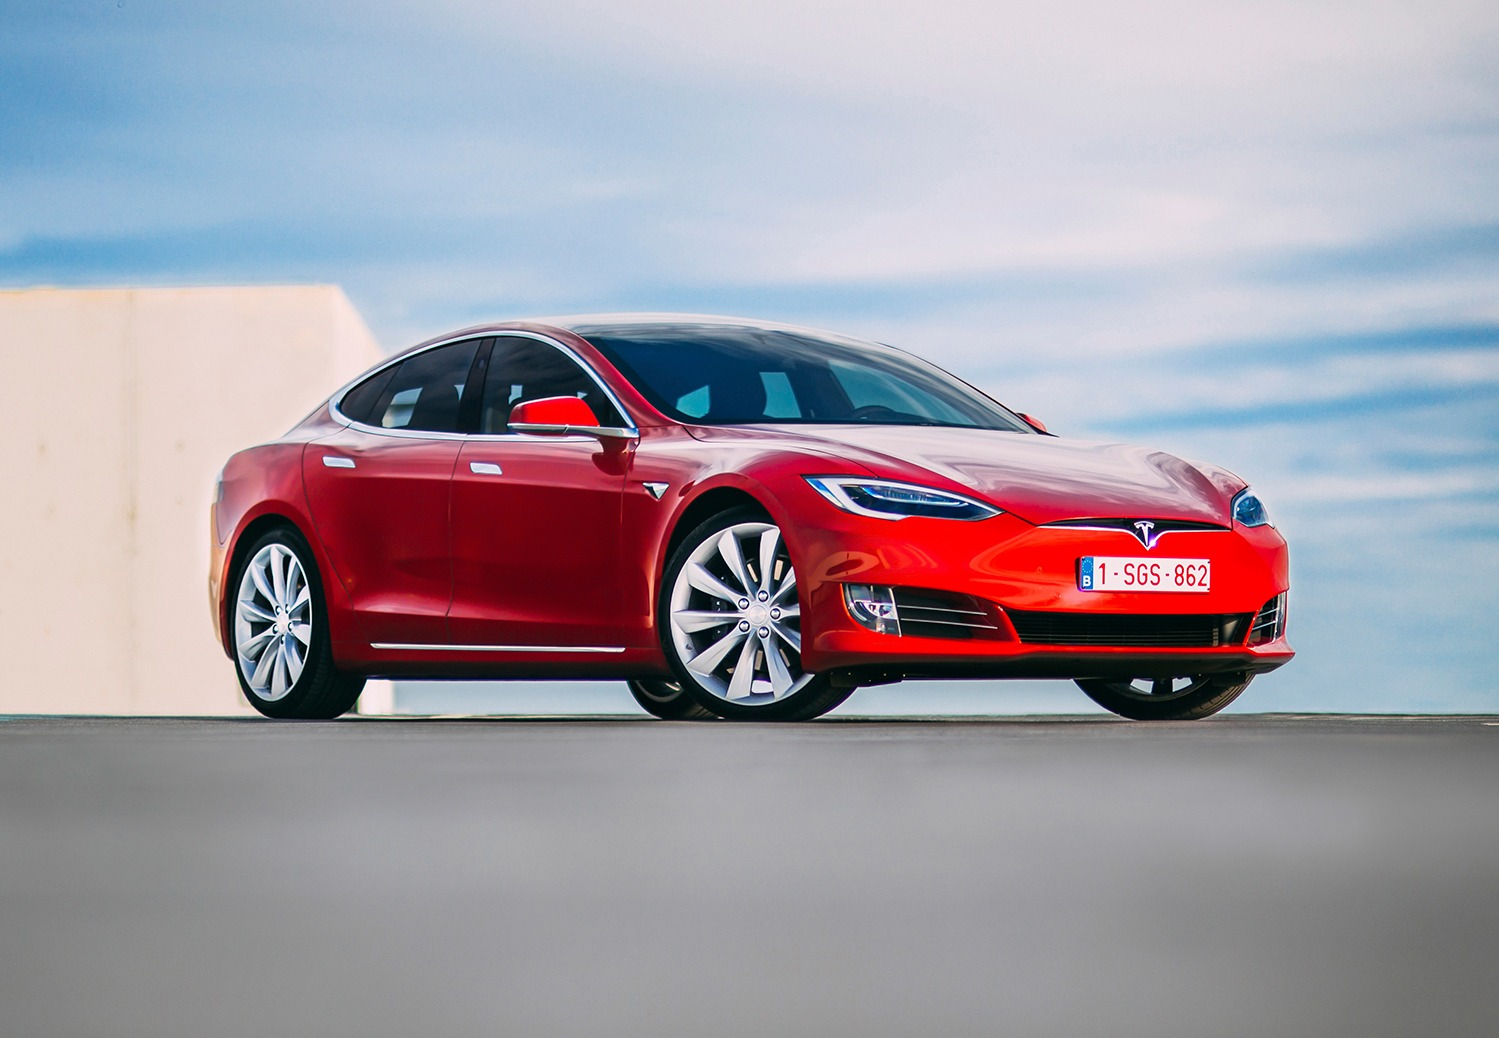 Rijtest: Tesla Model S 100D